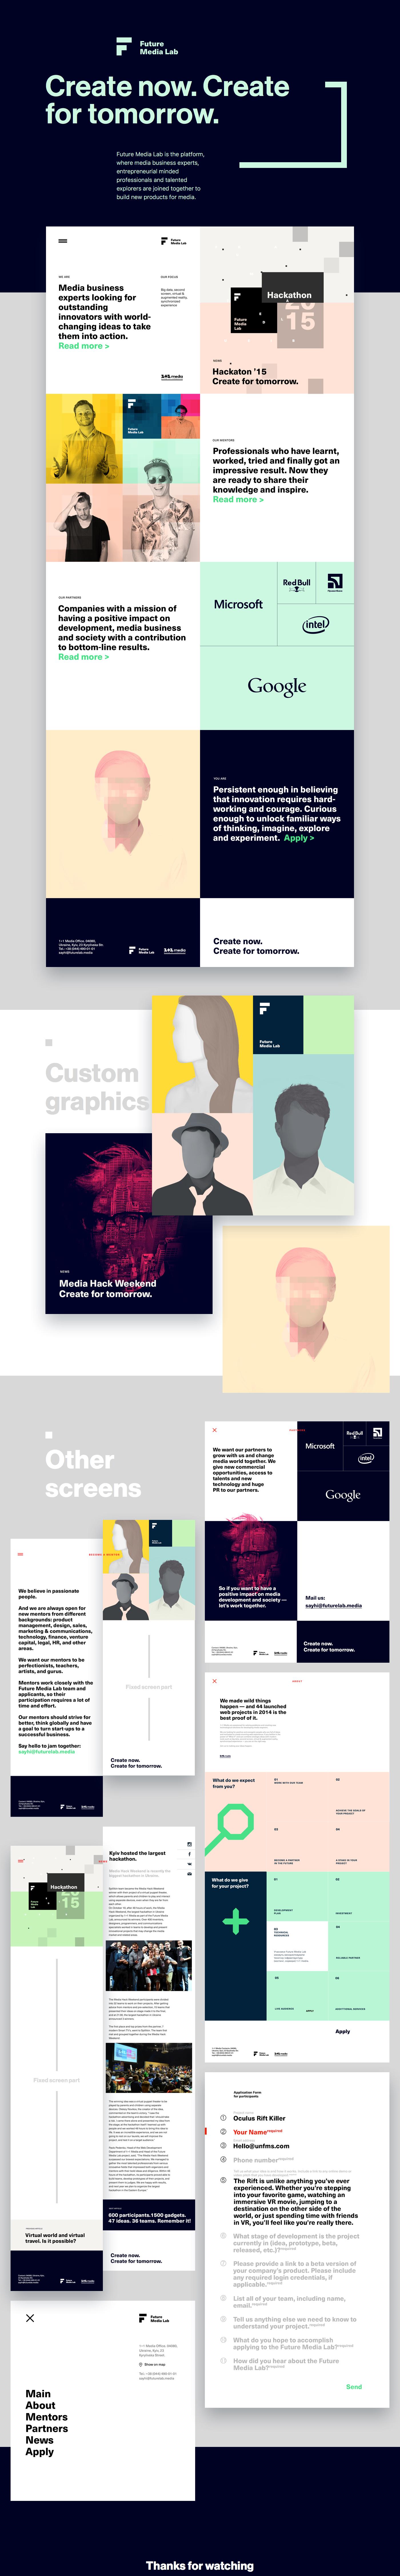 1+1 hackaton IT innovations Platform contest ukraine digital Webdesign minimal ILLUSTRATION  typographical